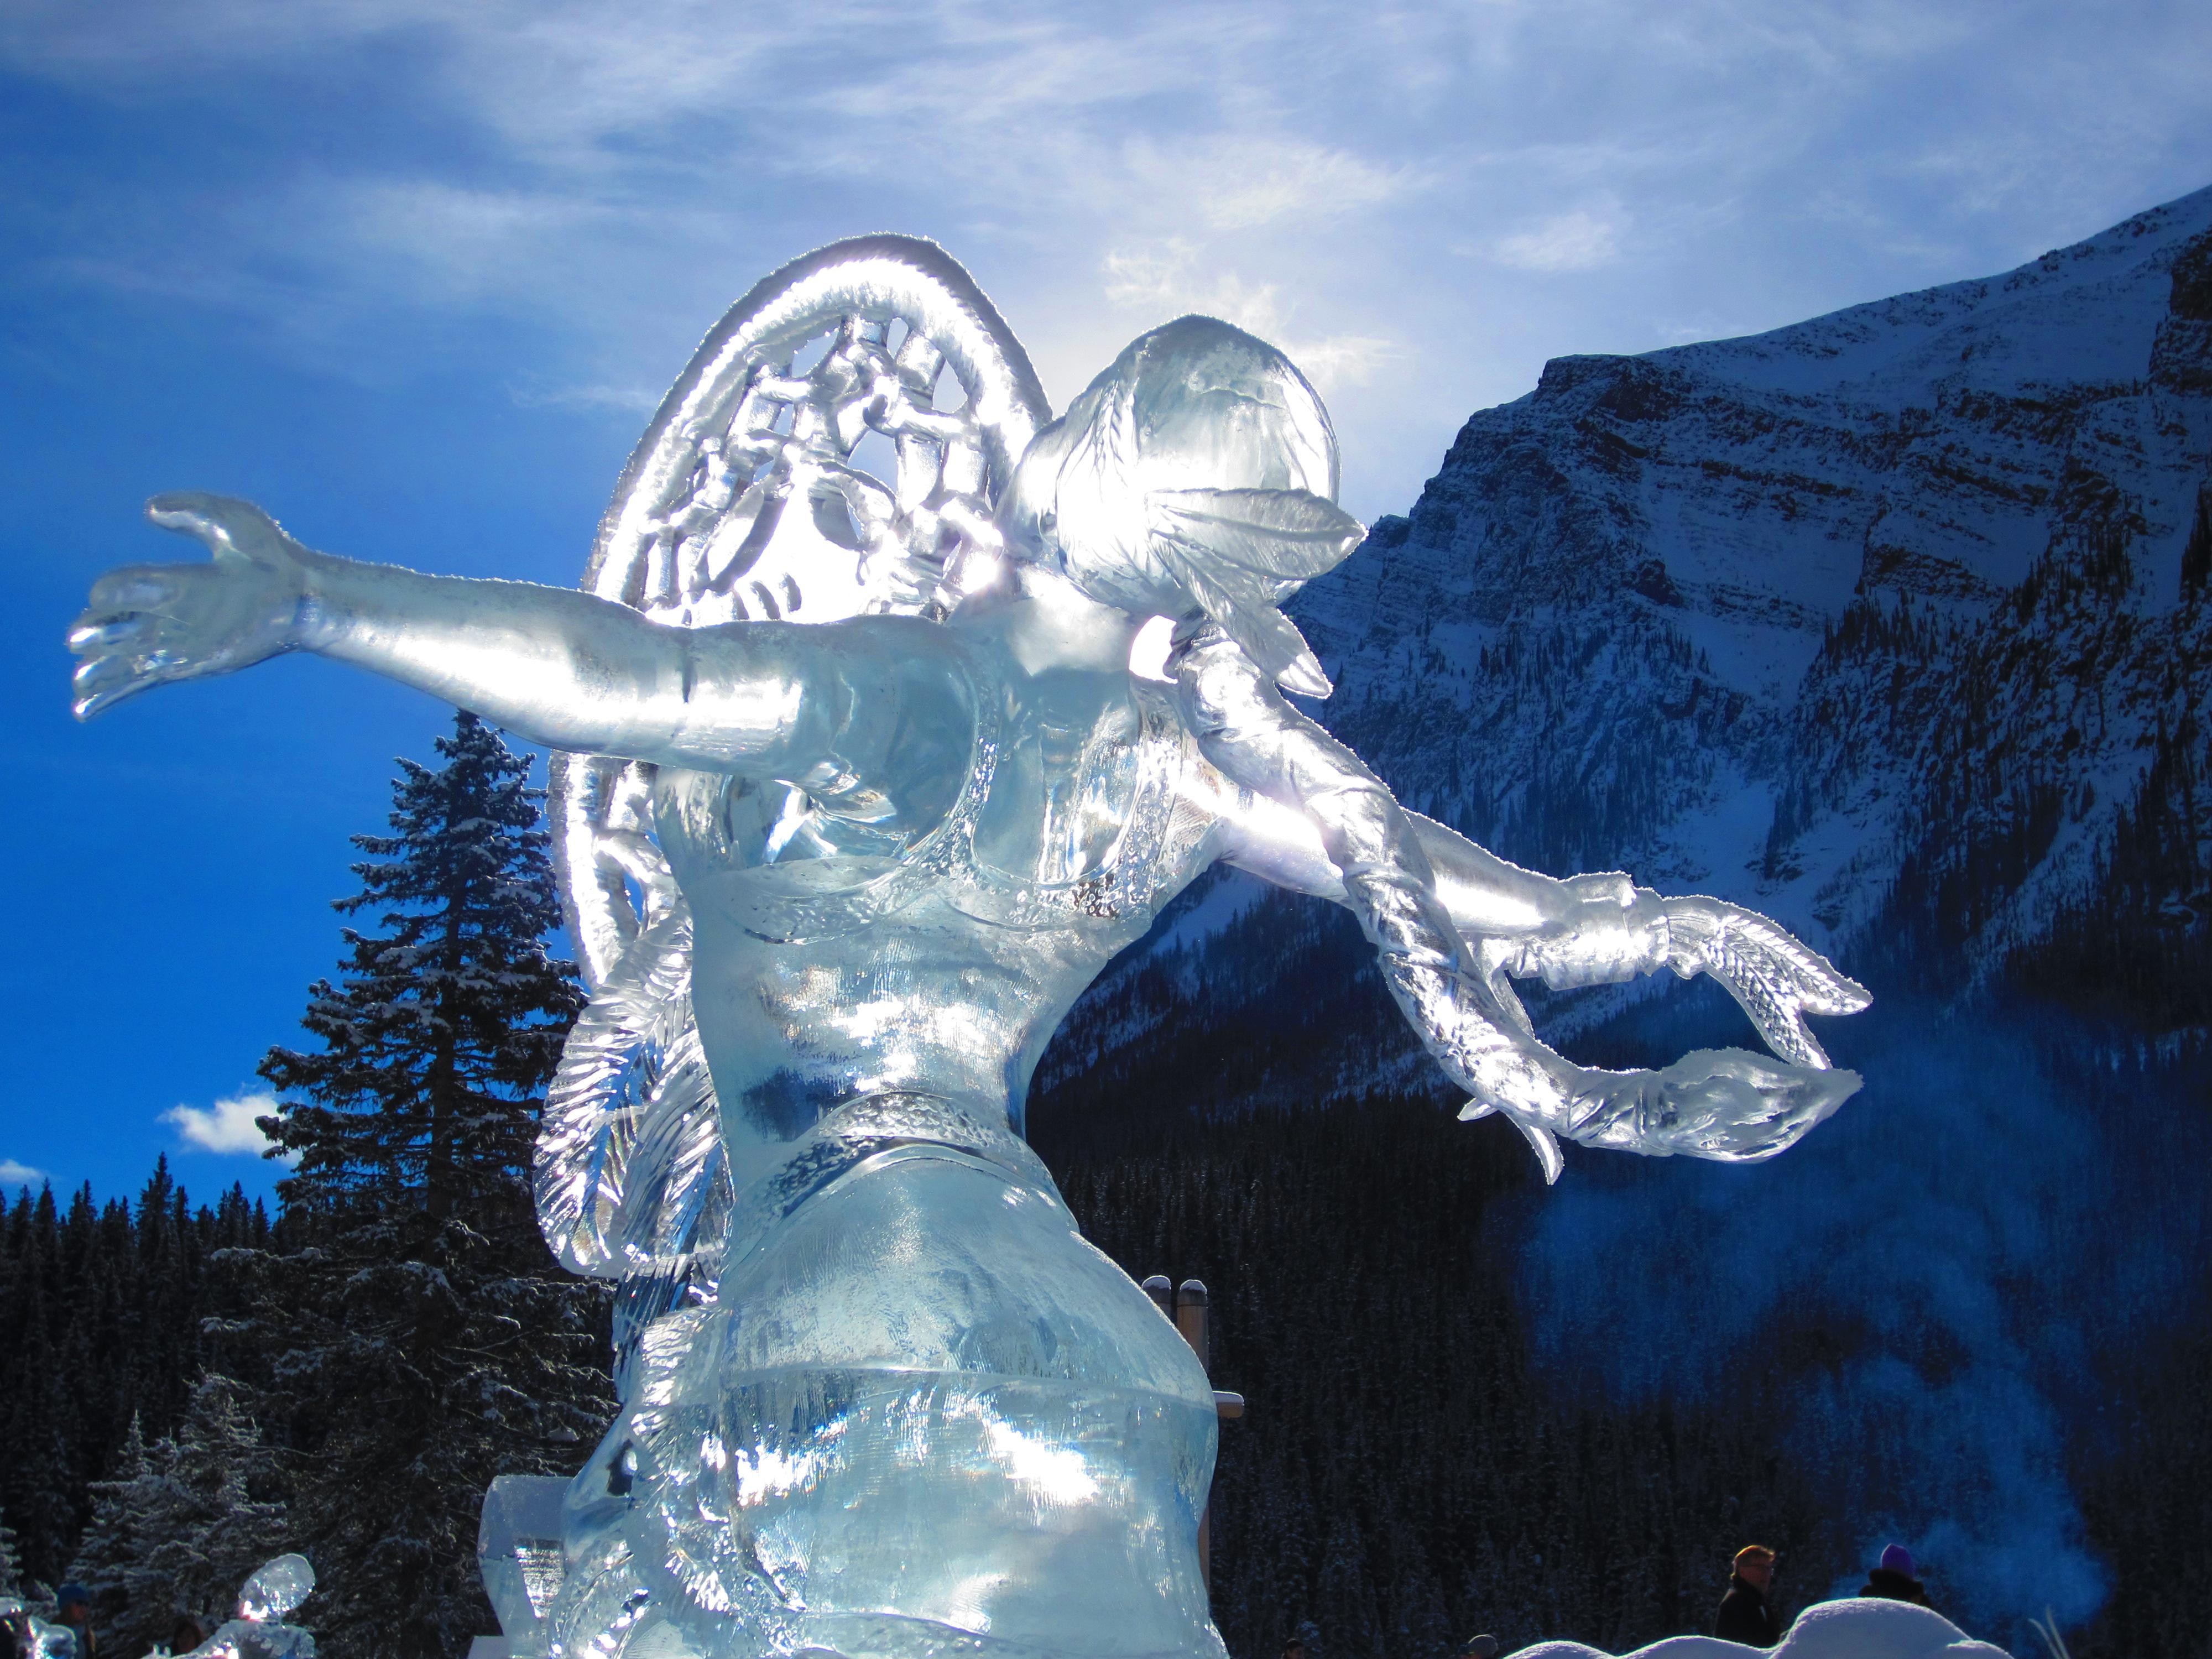 Ice sculptures in banff national park magic festival